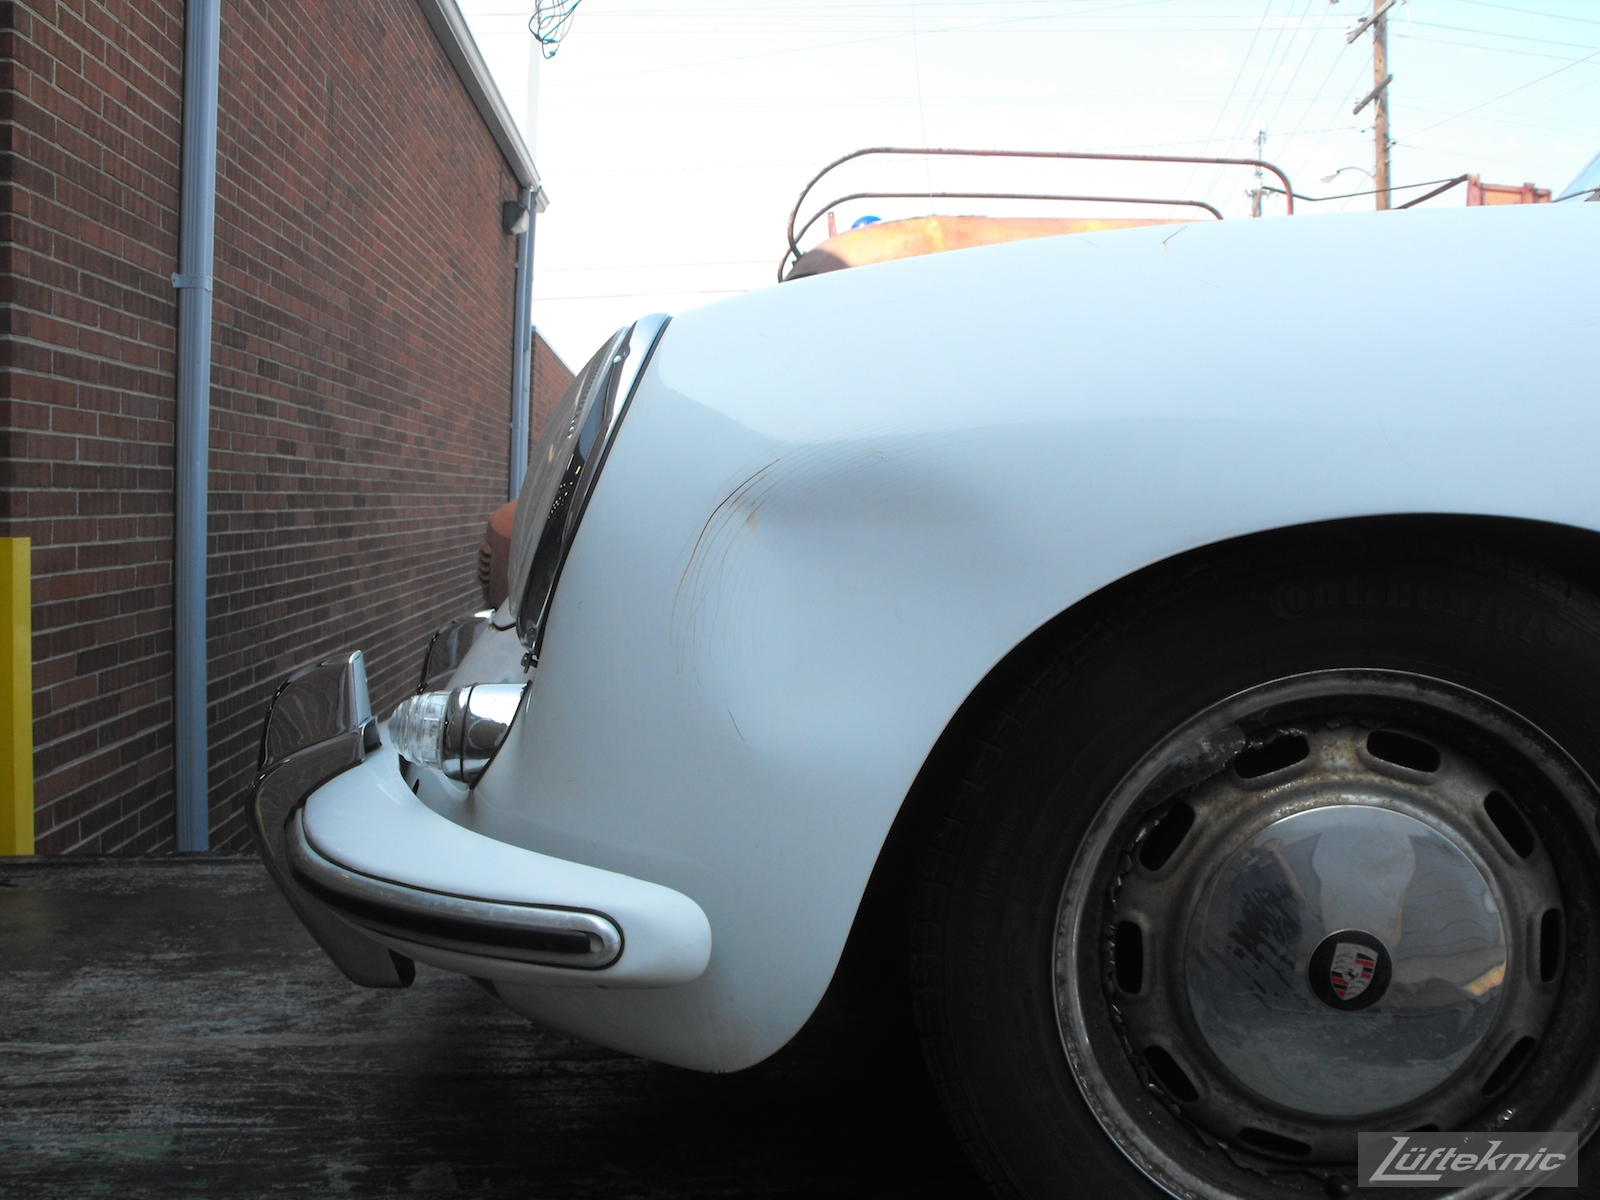 Dented fender pre 1964 Porsche 356SC restoration.